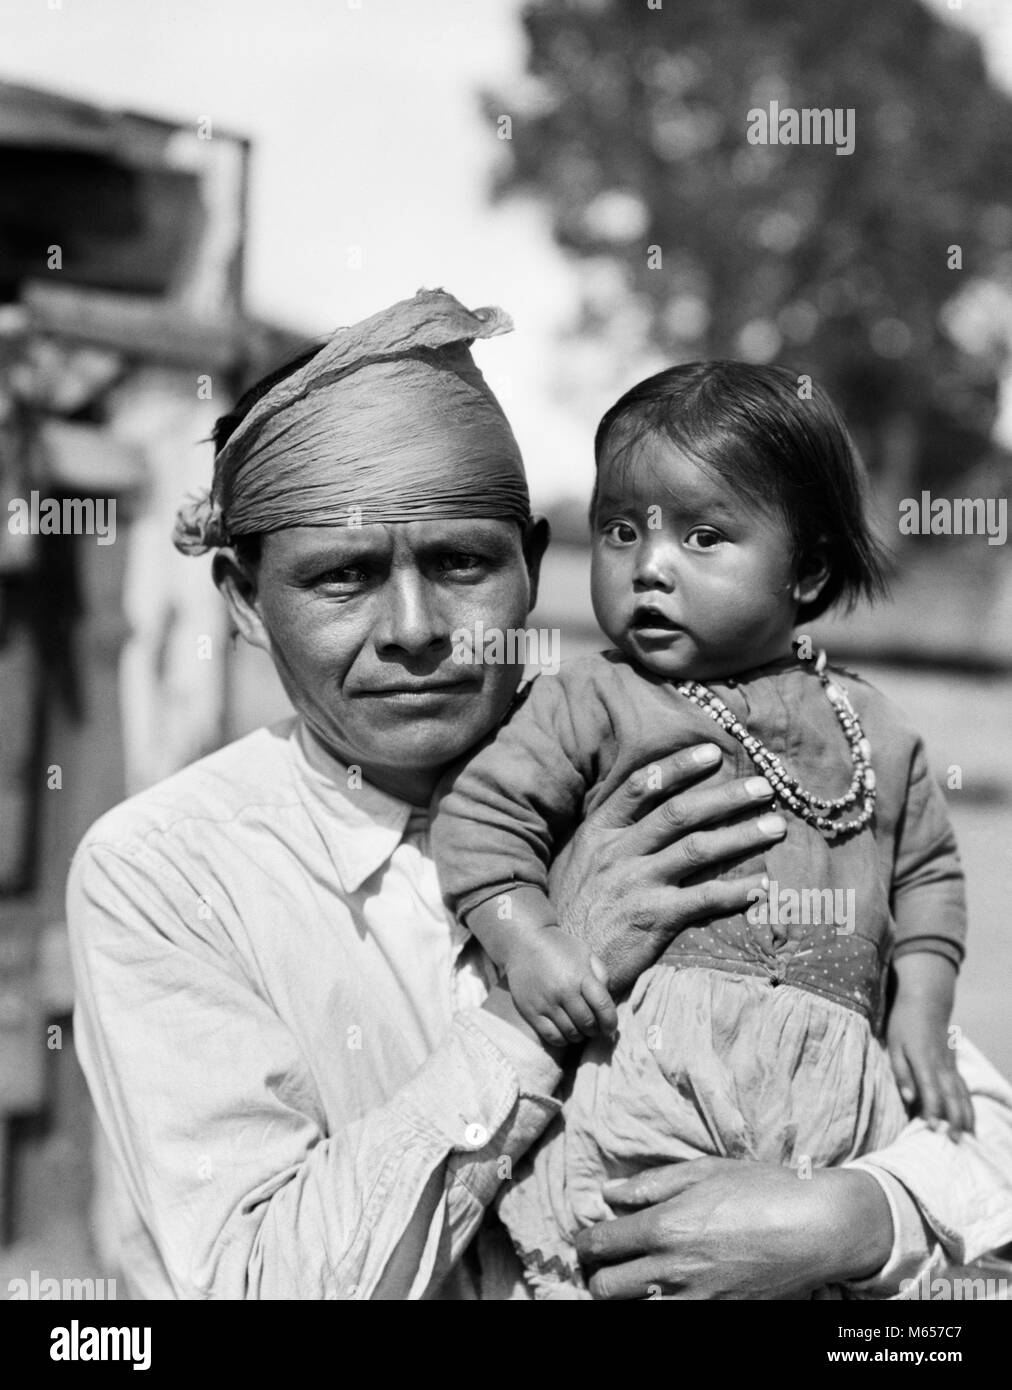 116e84ba7 1930 Native American NAVAJO HOLDING HOMBRE PADRE NIÑA hija mirando a la  Cámara - i1139 HAR001 HARS NAVAJO AMERICANA NOSTALGIA PADRES NORTEAMÉRICA  ...